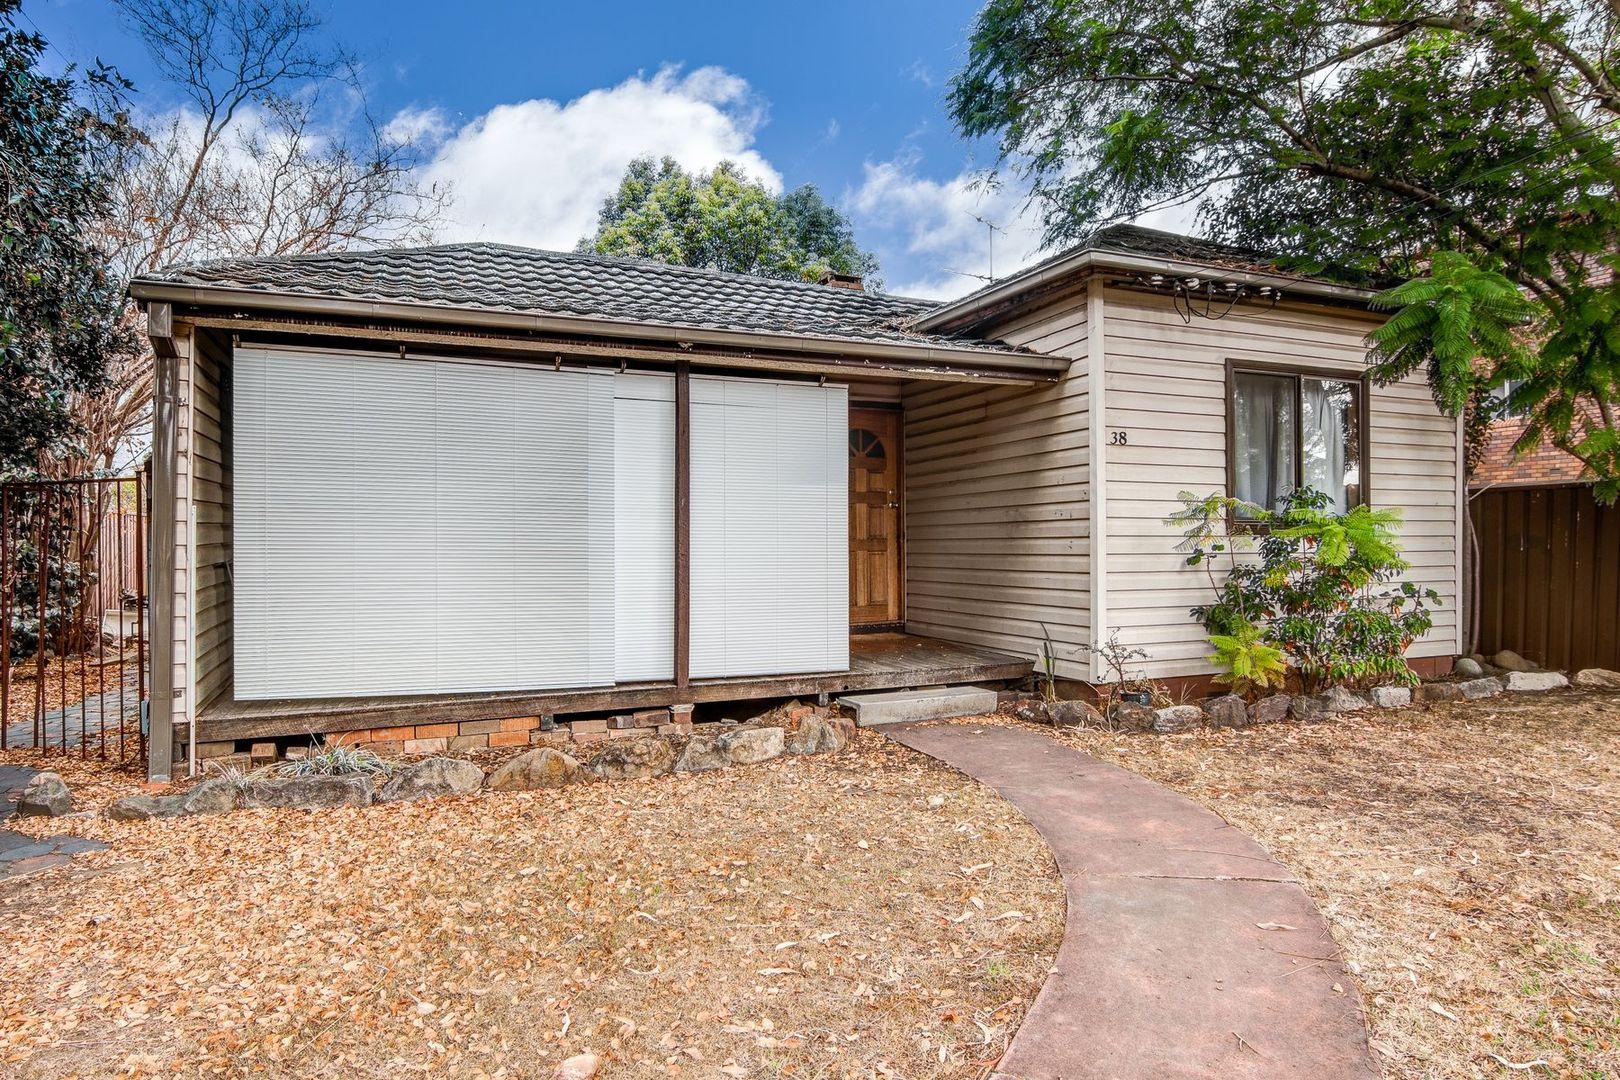 38 Putland Street, St Marys NSW 2760, Image 0